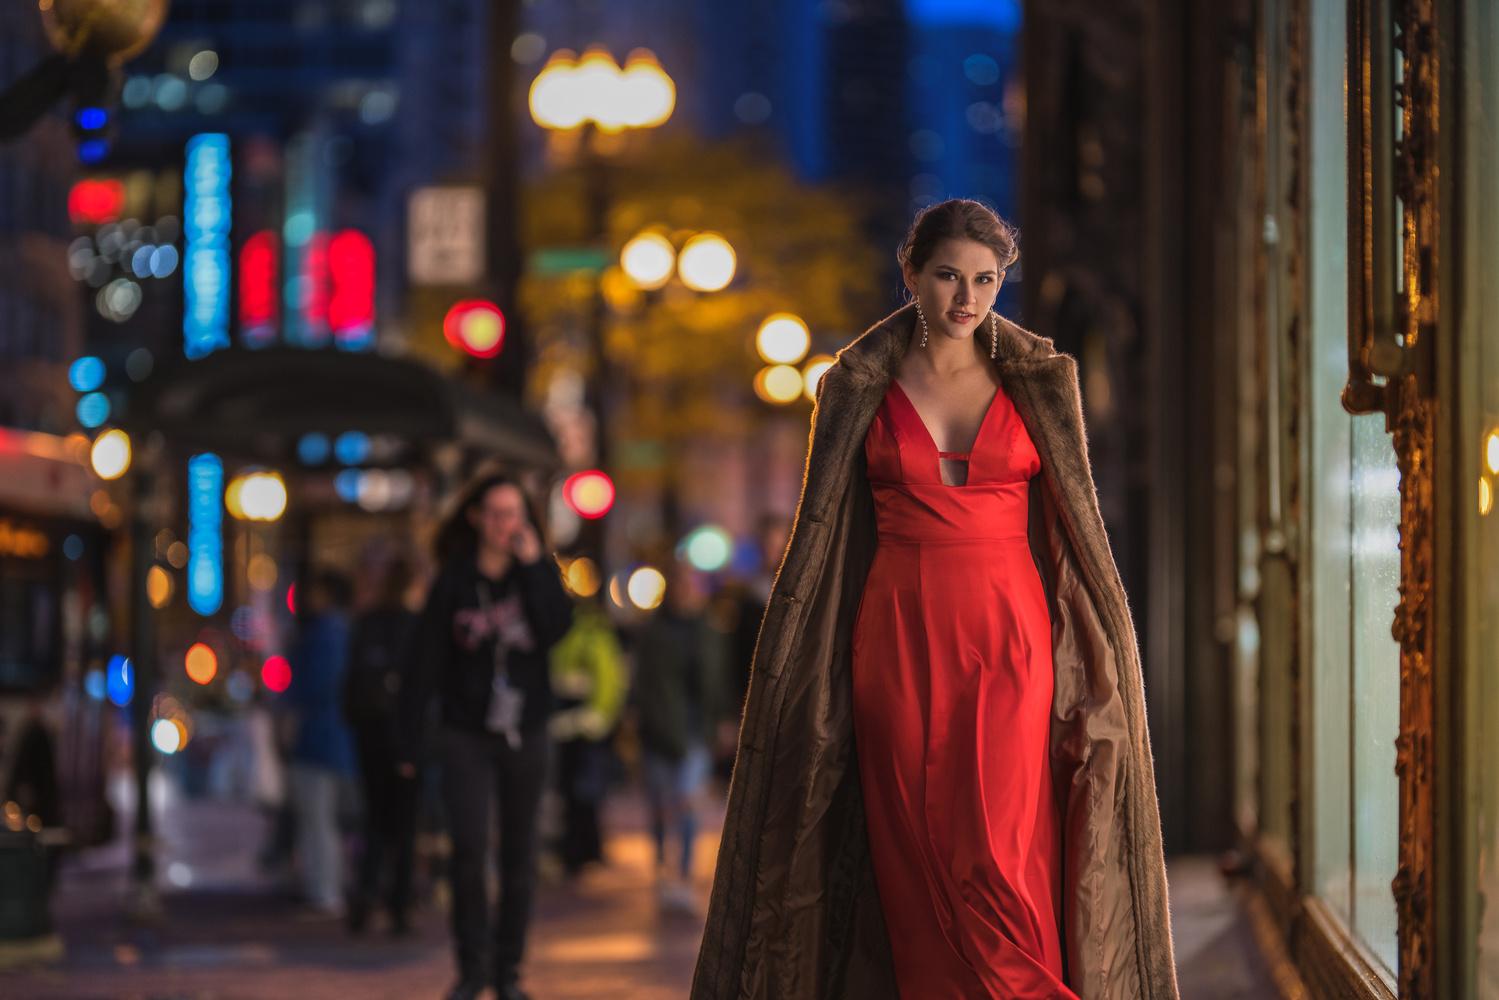 Chicago by Dan Rowe